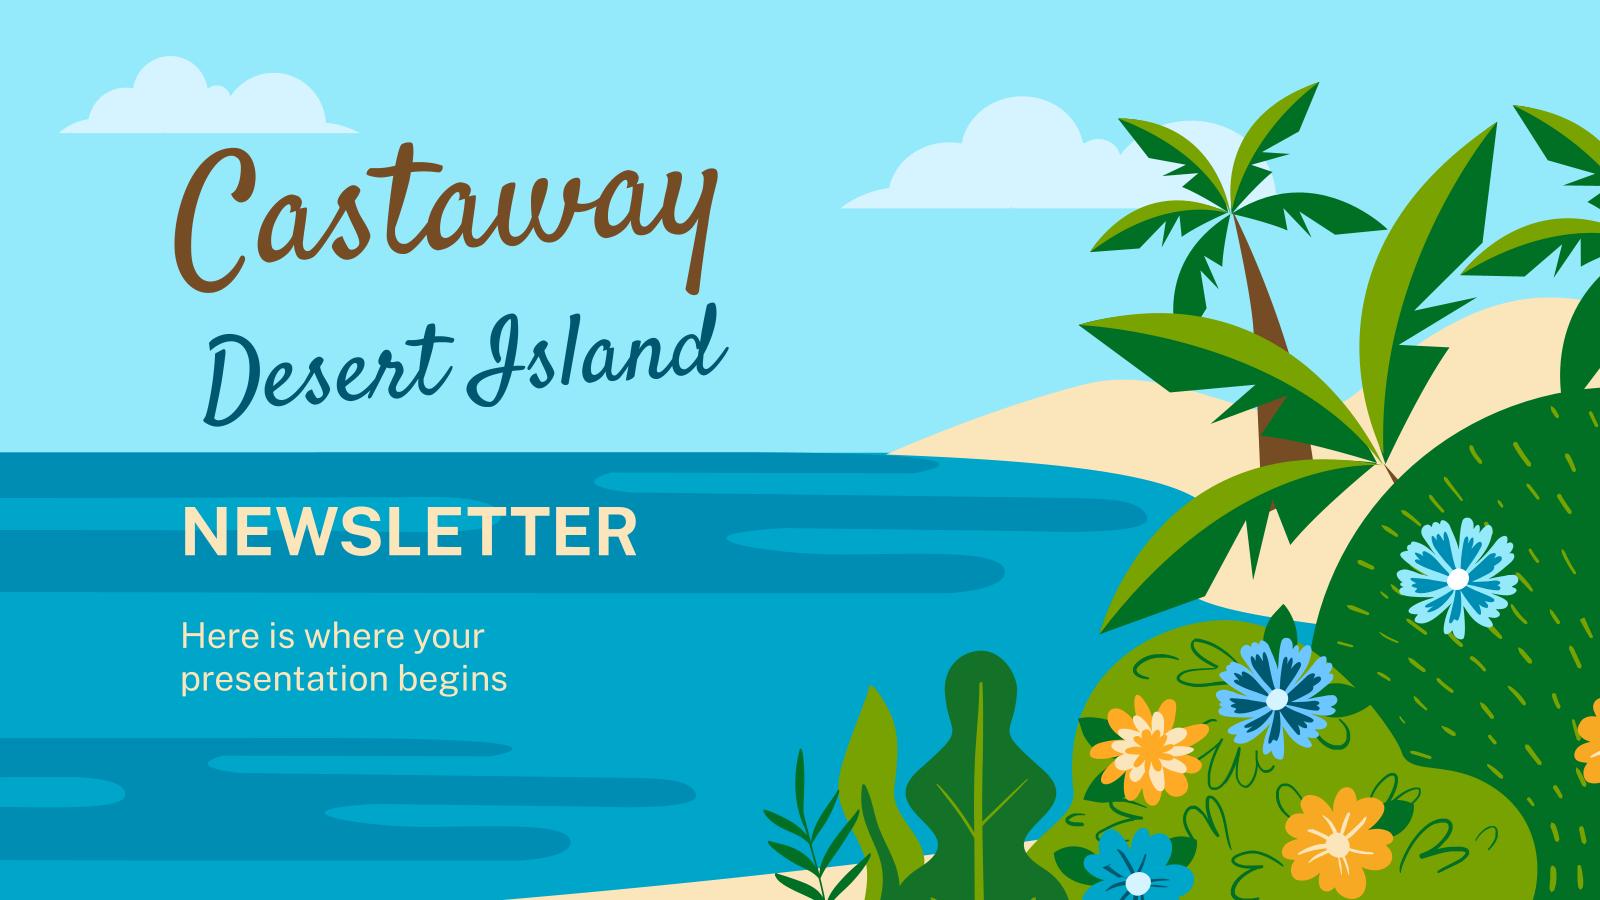 Castaway in a Desert Island presentation template